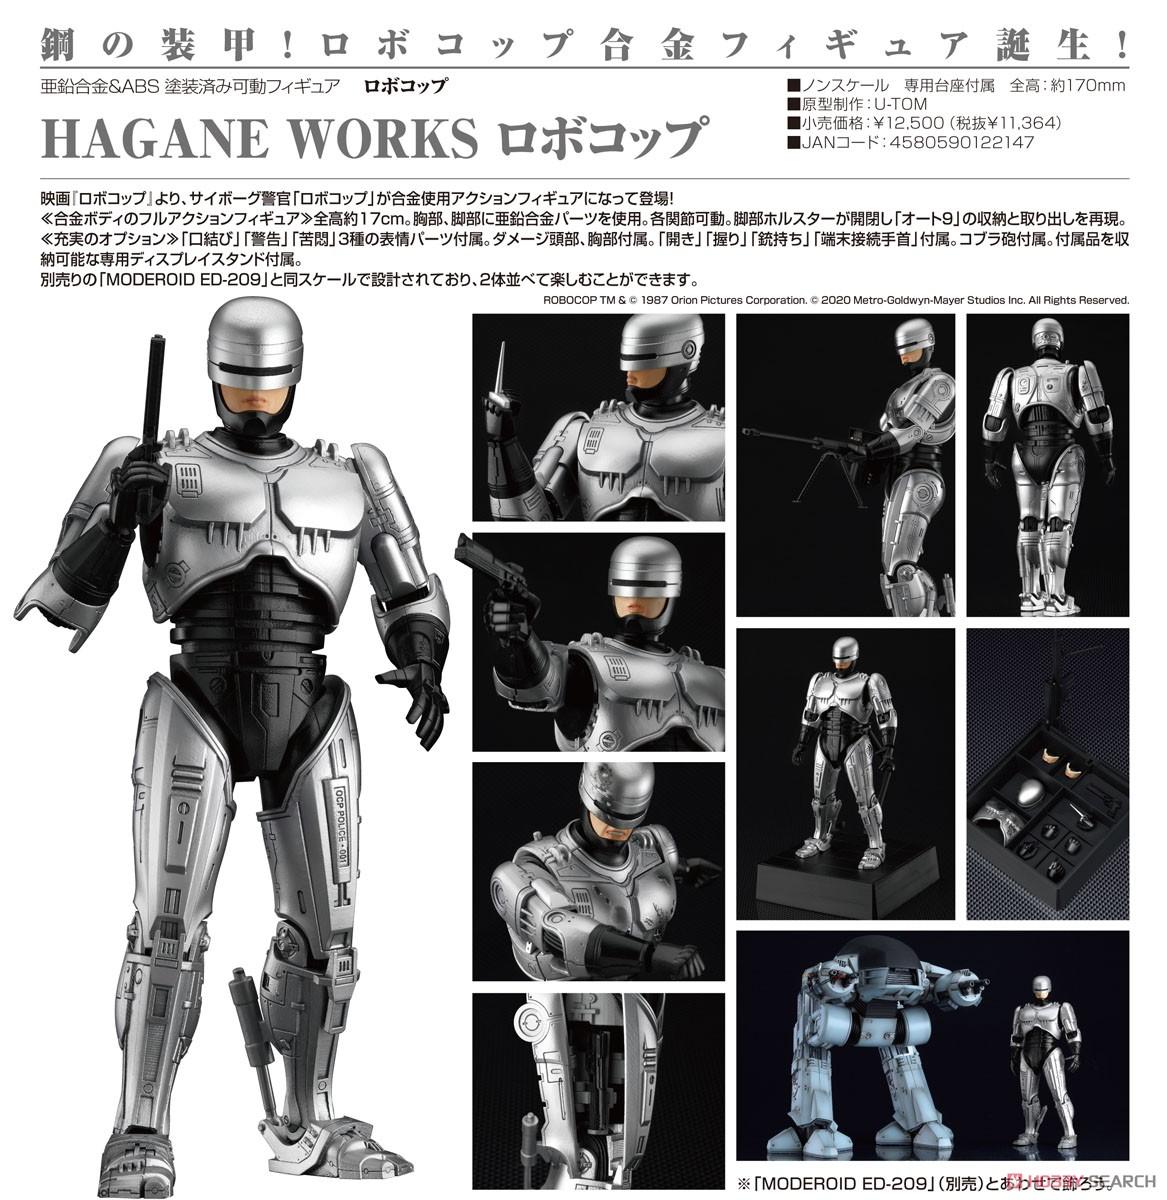 HAGANE WORKS『ロボコップ』可動フィギュア-014